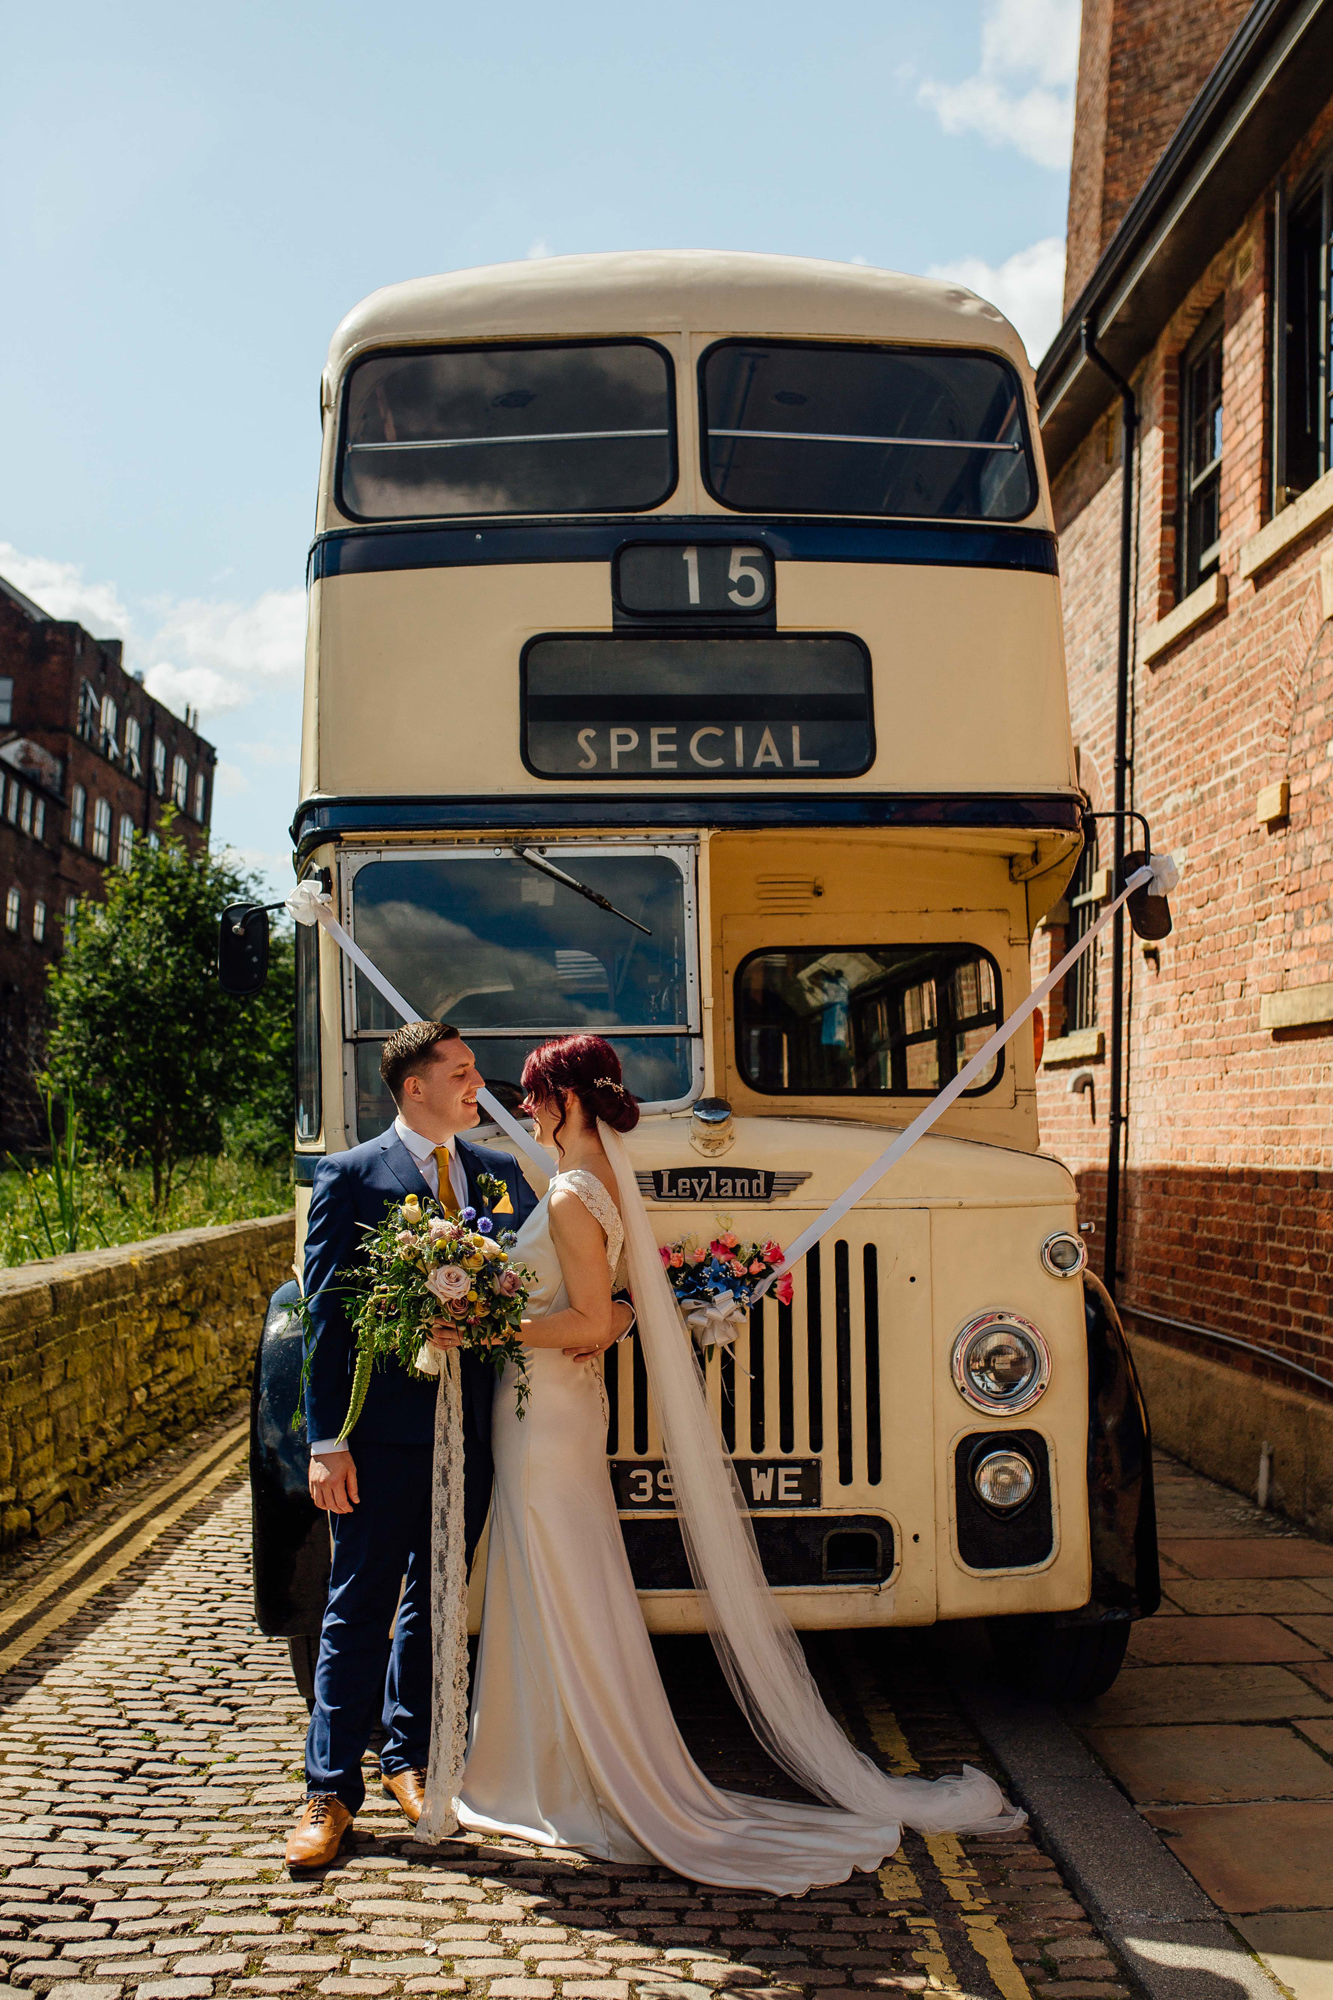 Sarah-Honeysuckle-Bias-Cut-Silk-Vintage-Inspired-Wedding-Gown-Sheffield-Wedding-Kate-Beaumont-40.jpg